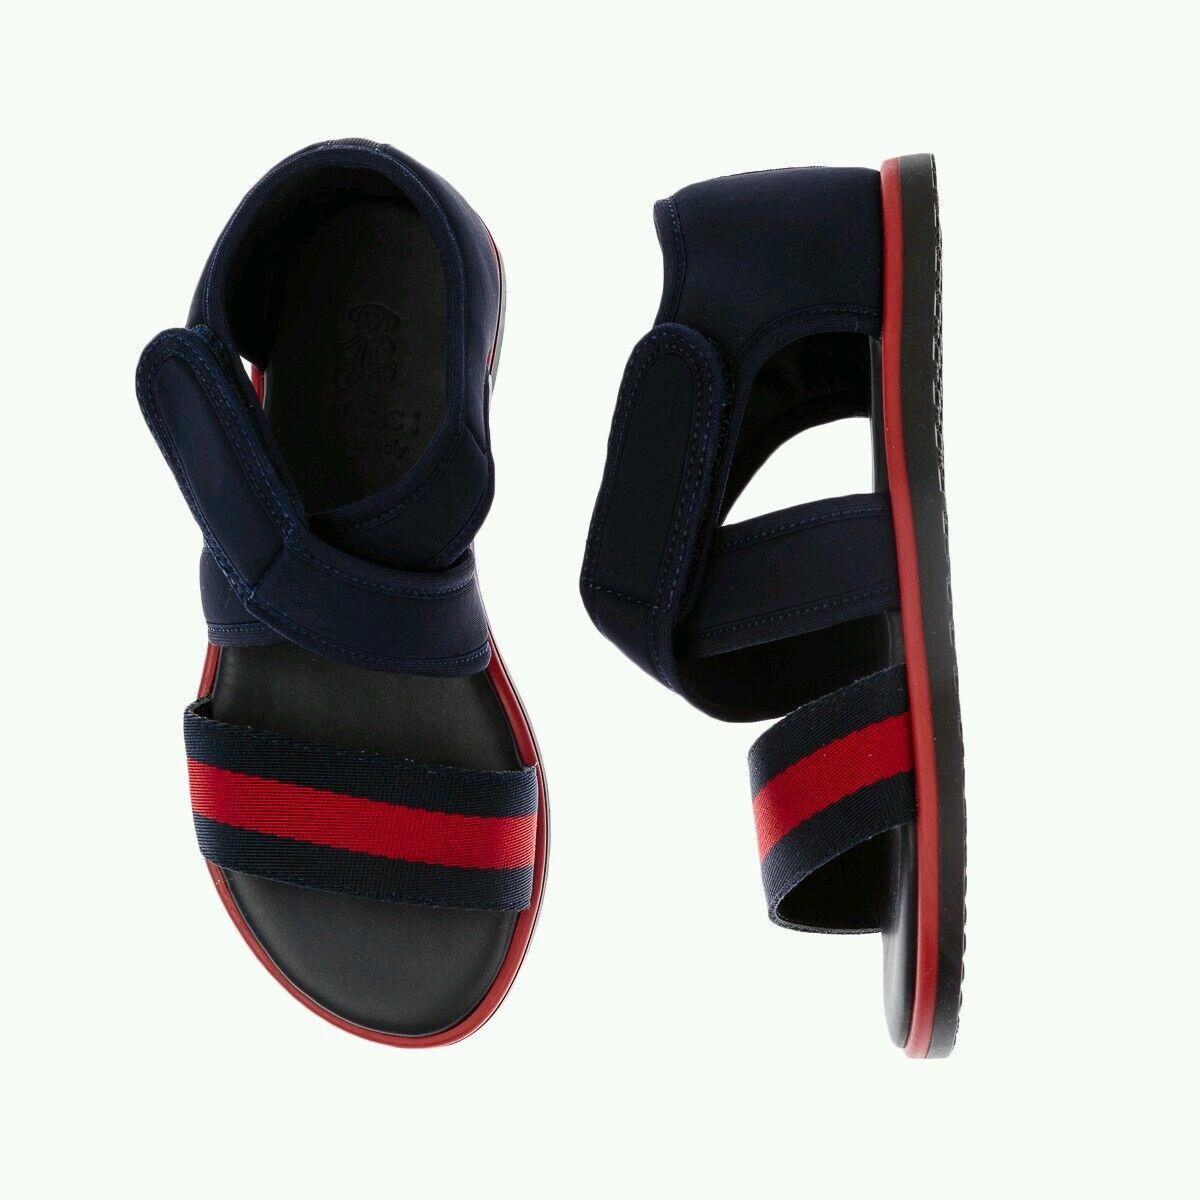 NIB NEW Gucci boys kids navy blue red web strap sandals 20 4 21 5 371588